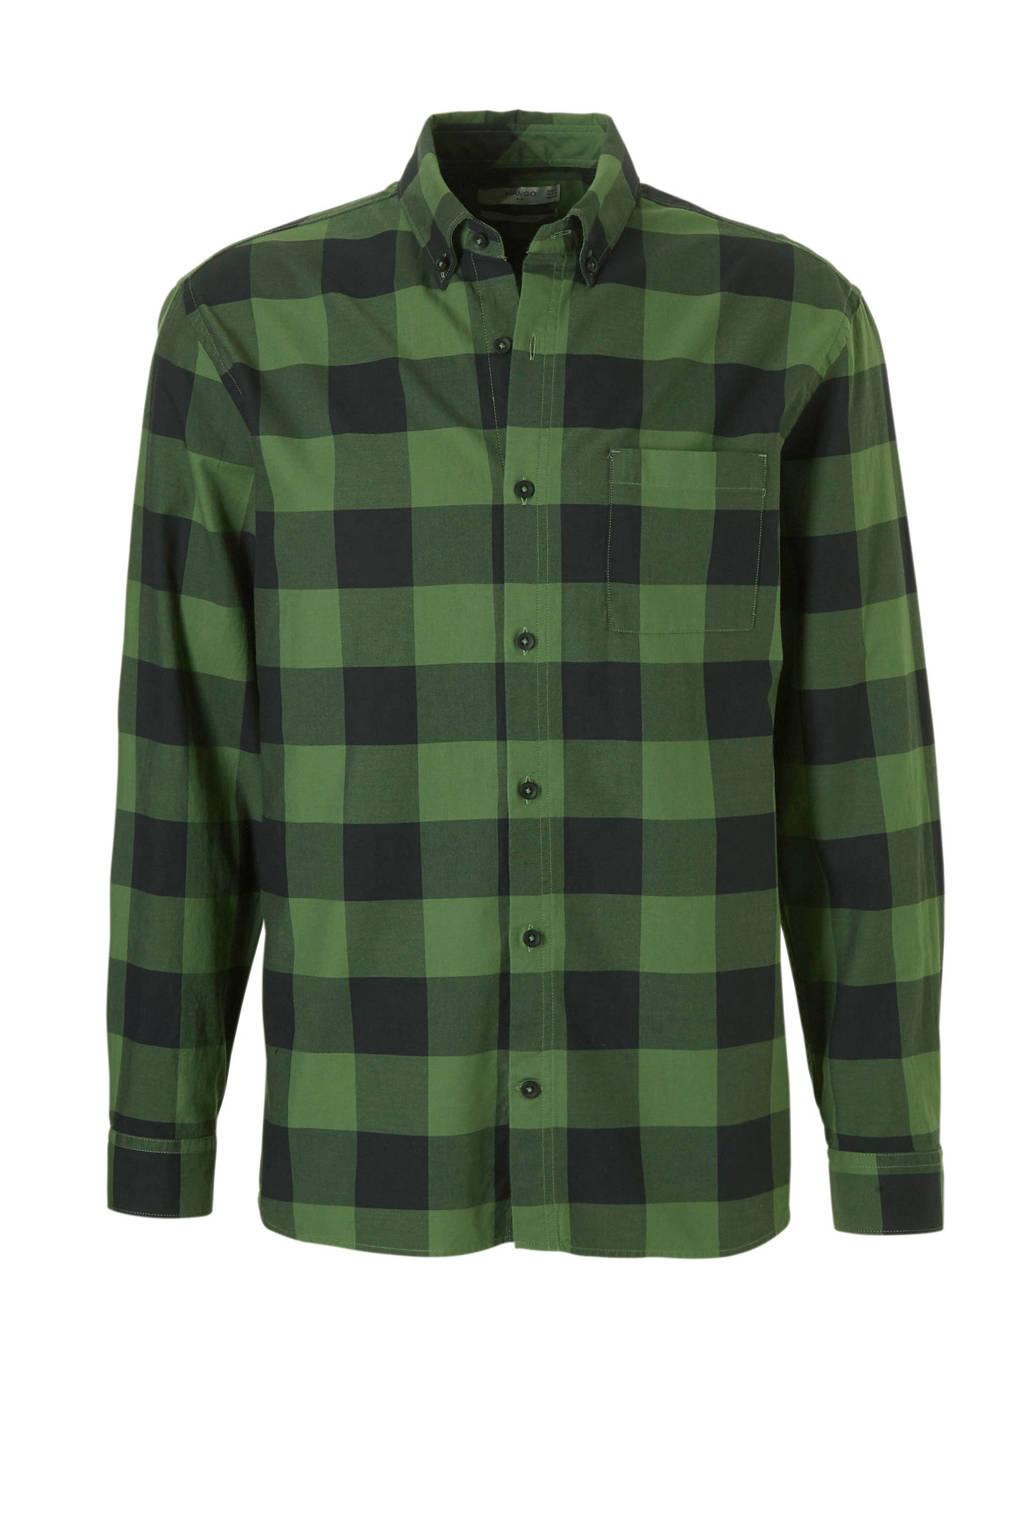 Groen Geruit Overhemd.Mango Man Geruit Overhemd Groen Wehkamp